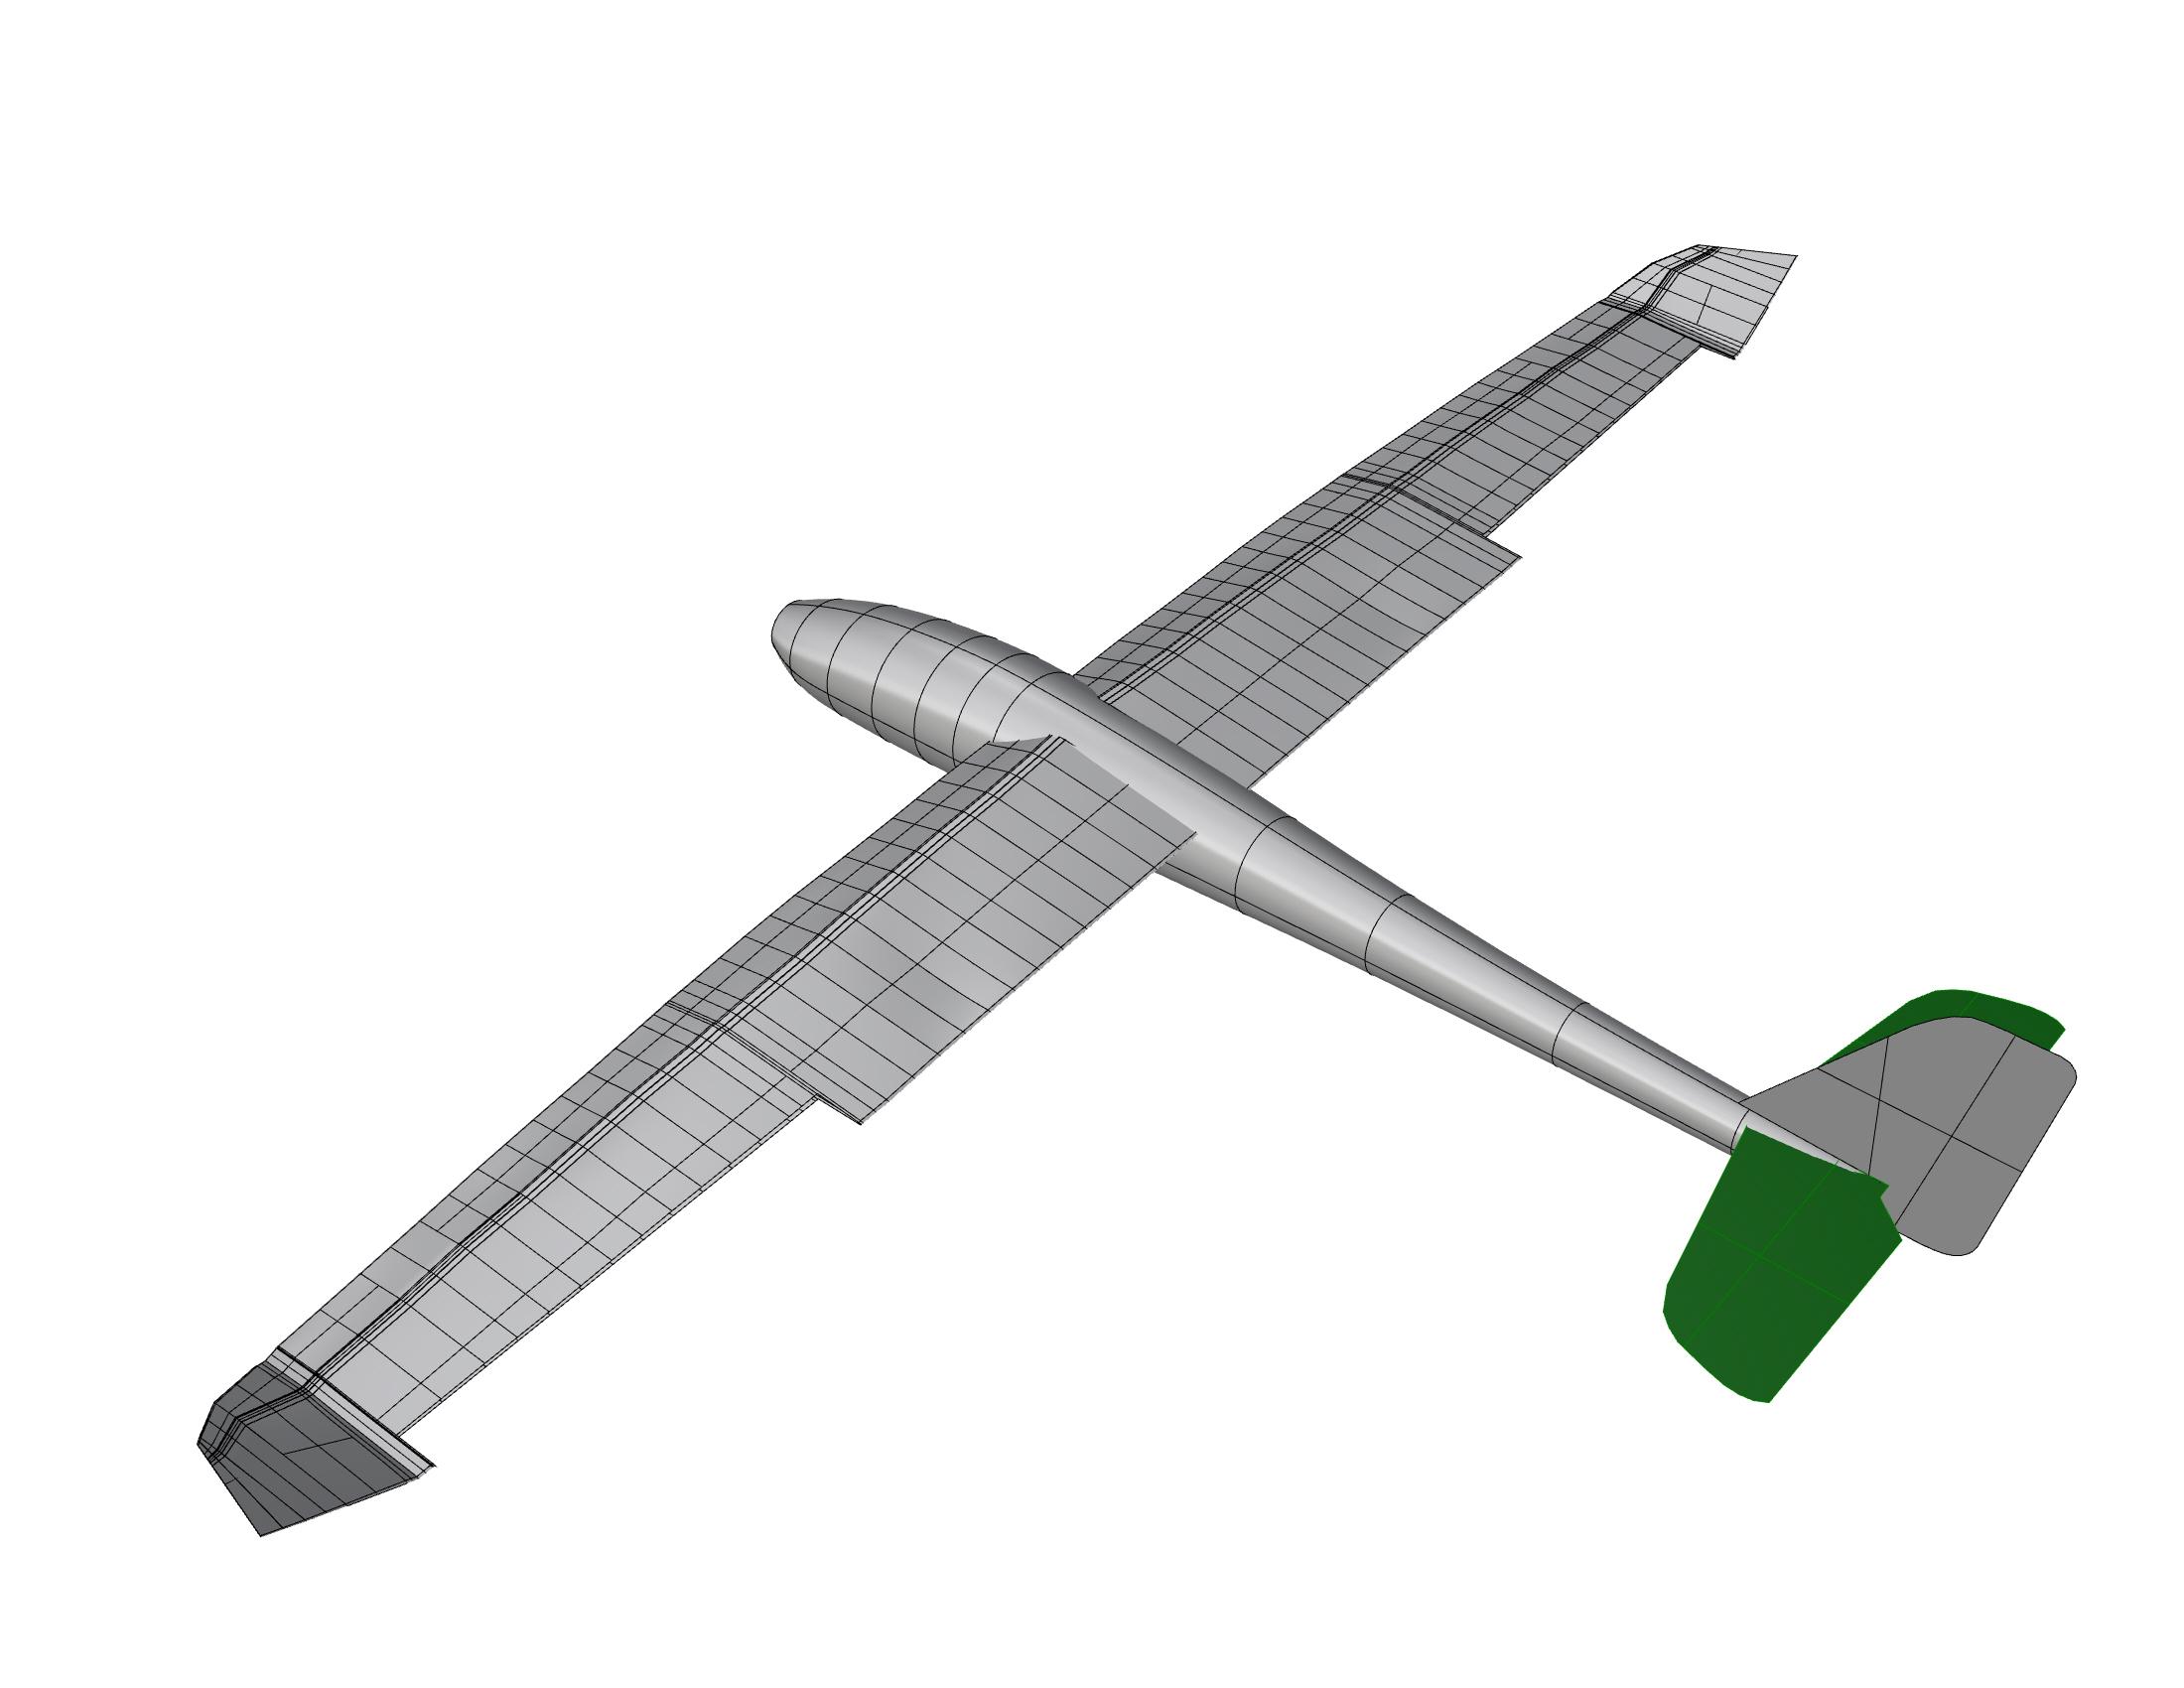 3D Model Picture 6.jpg